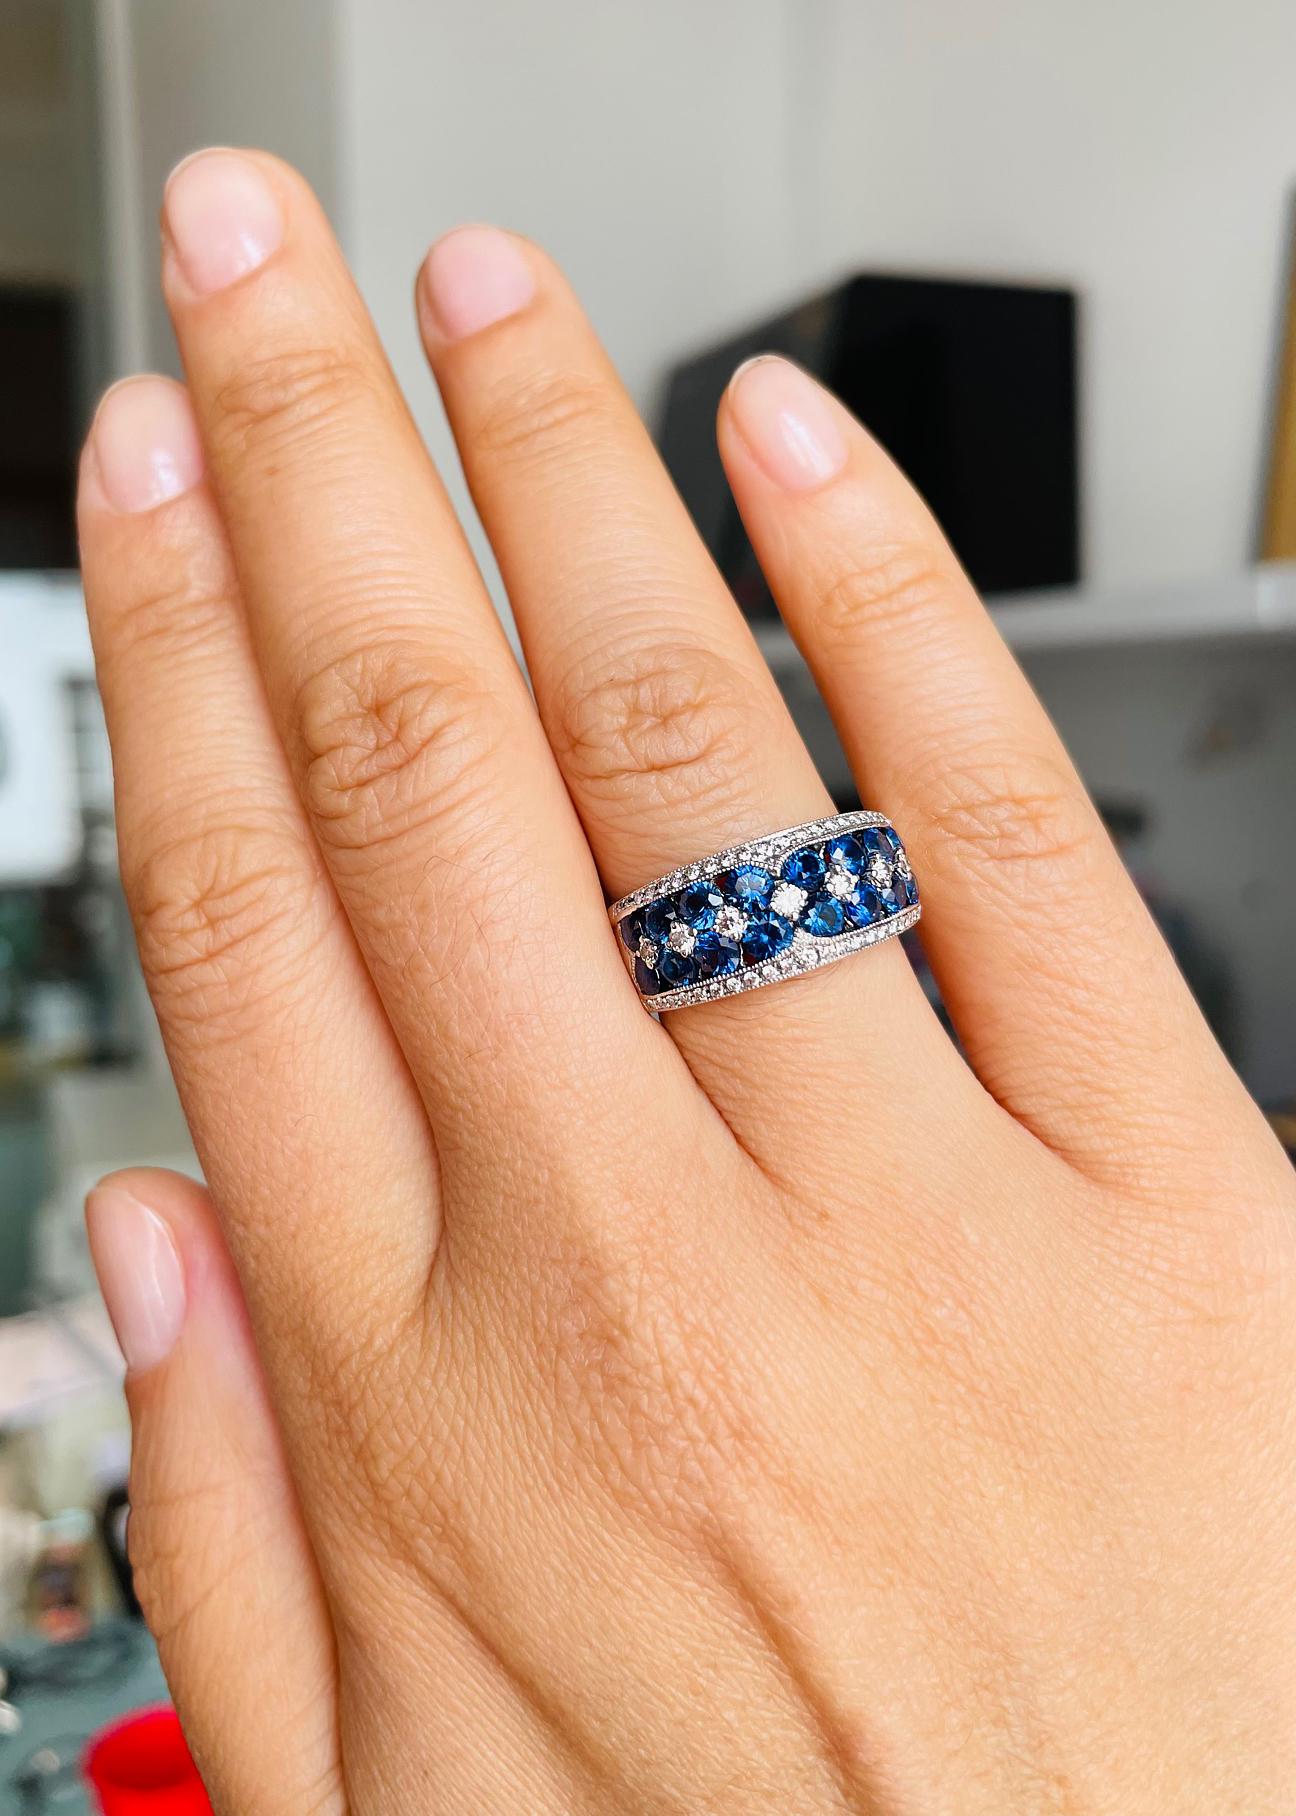 White Gold Dress Ring With Round Sapphire & Diamonds